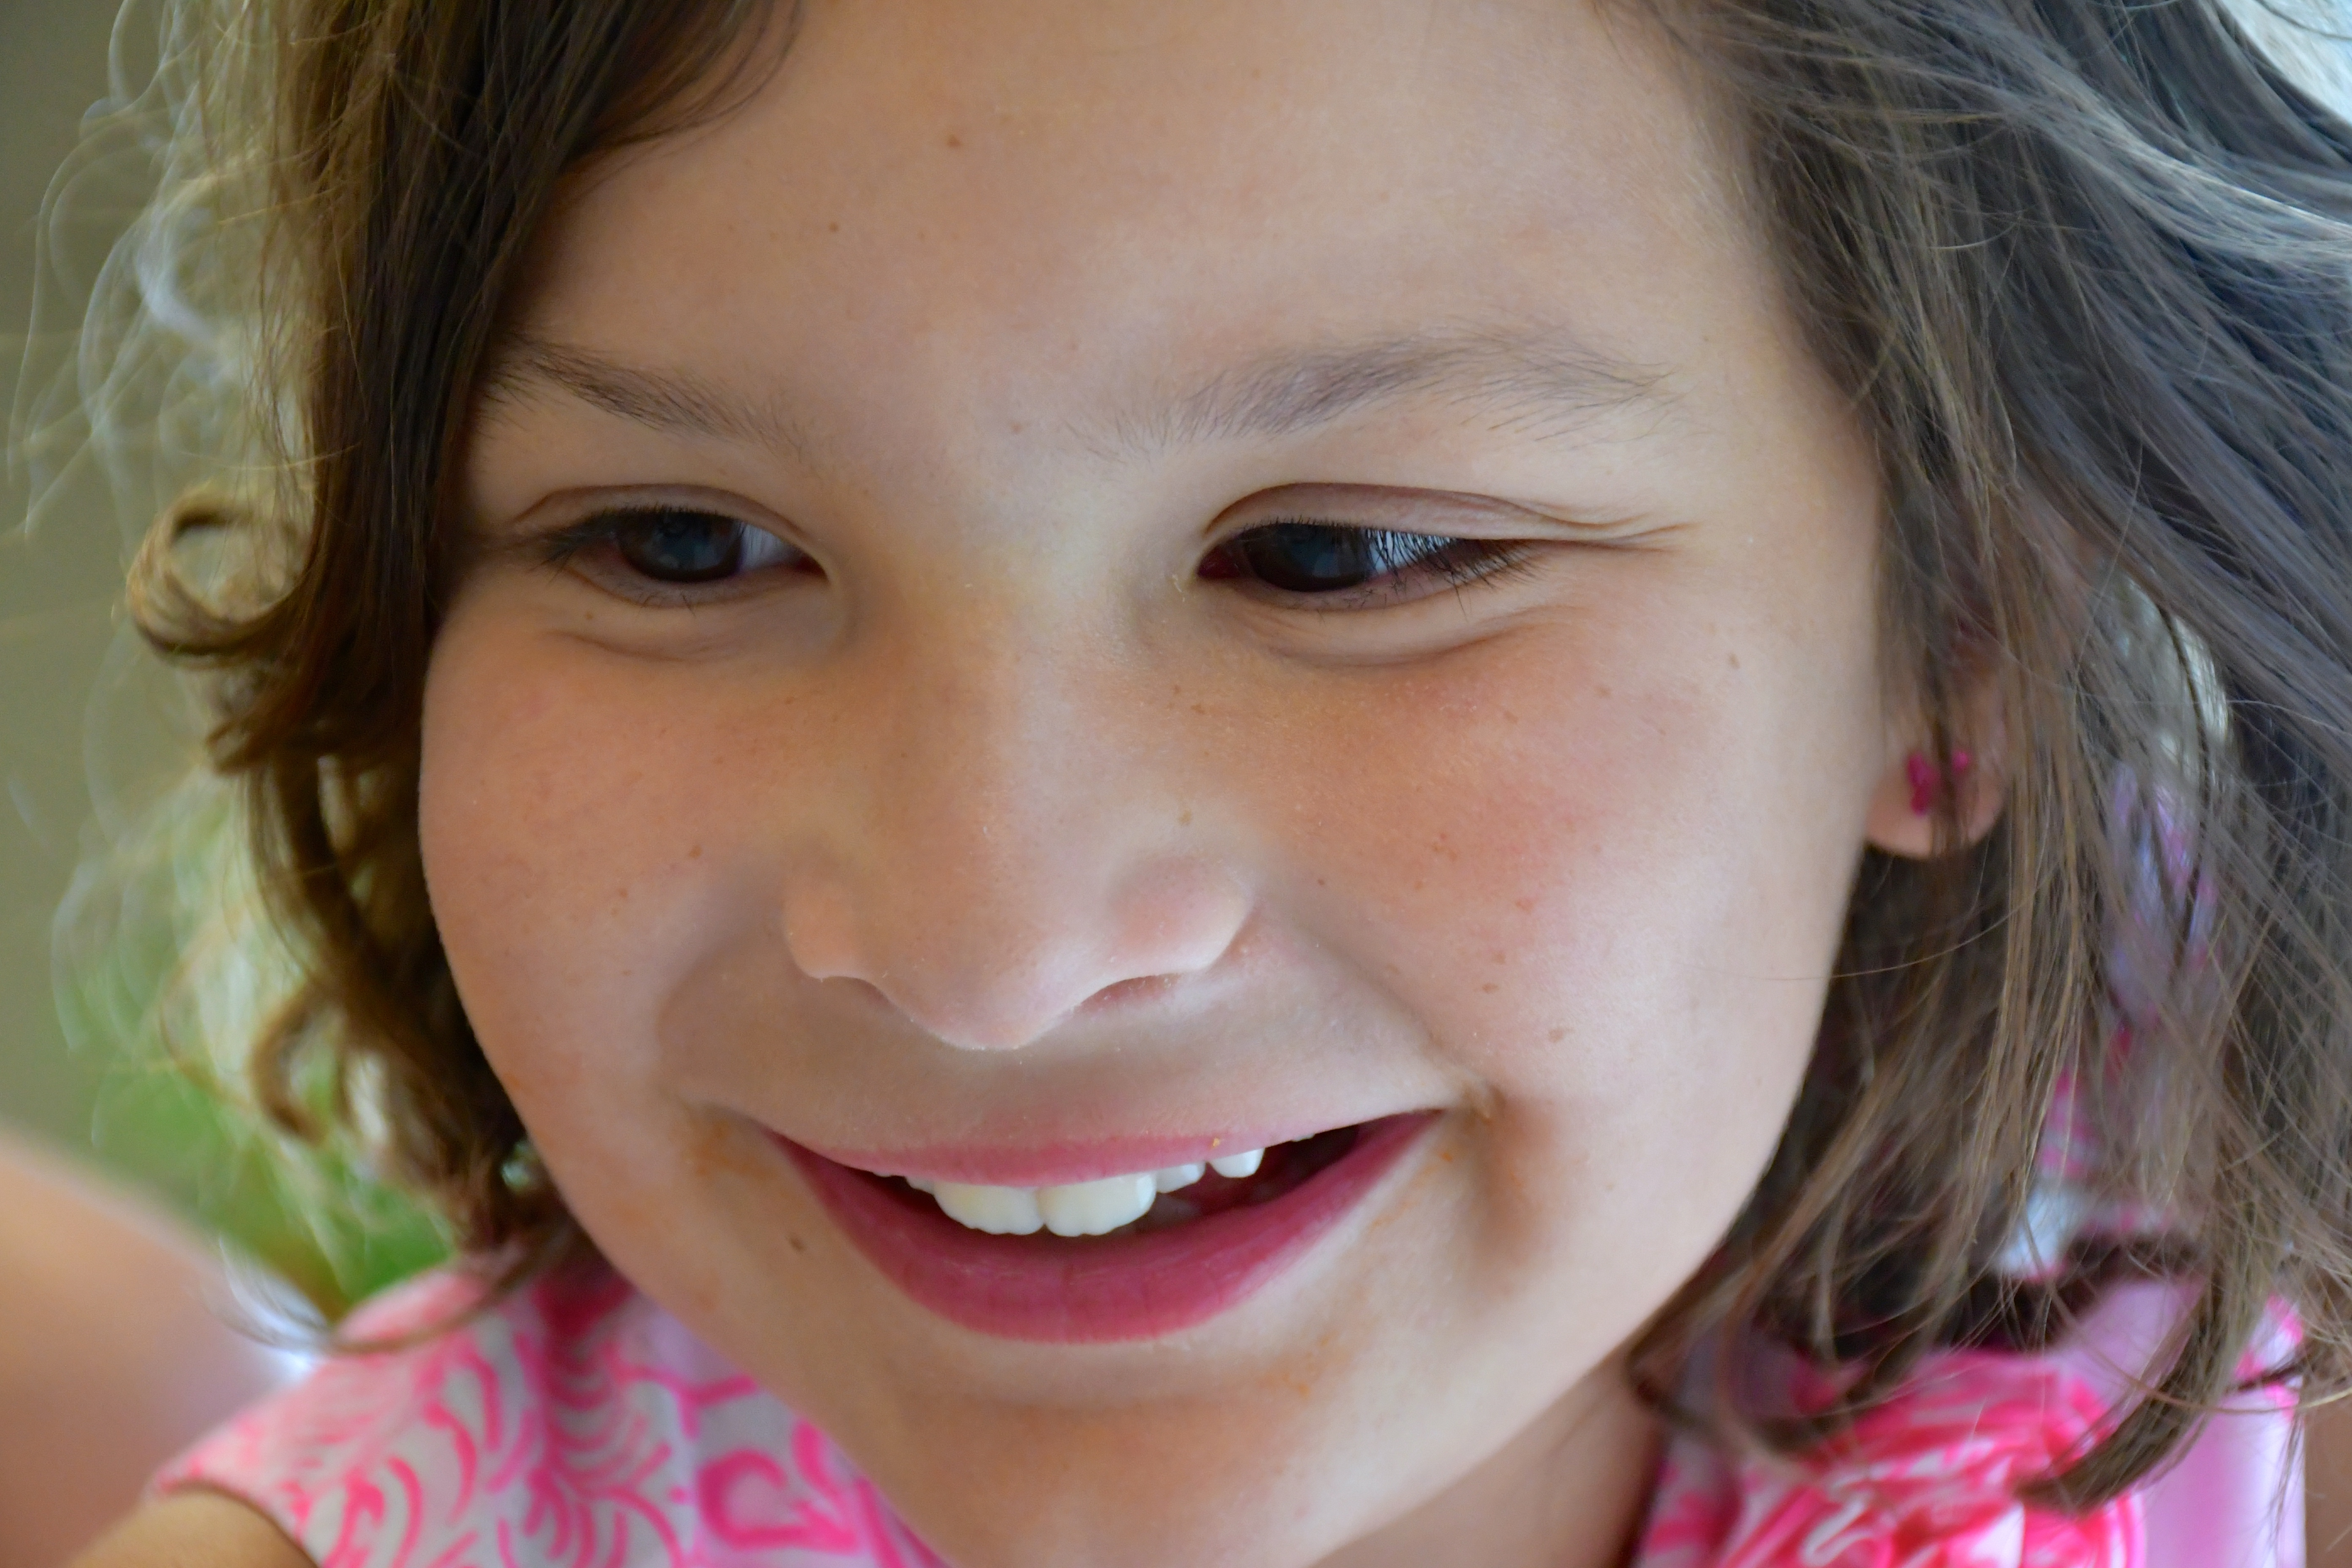 Grace smiles